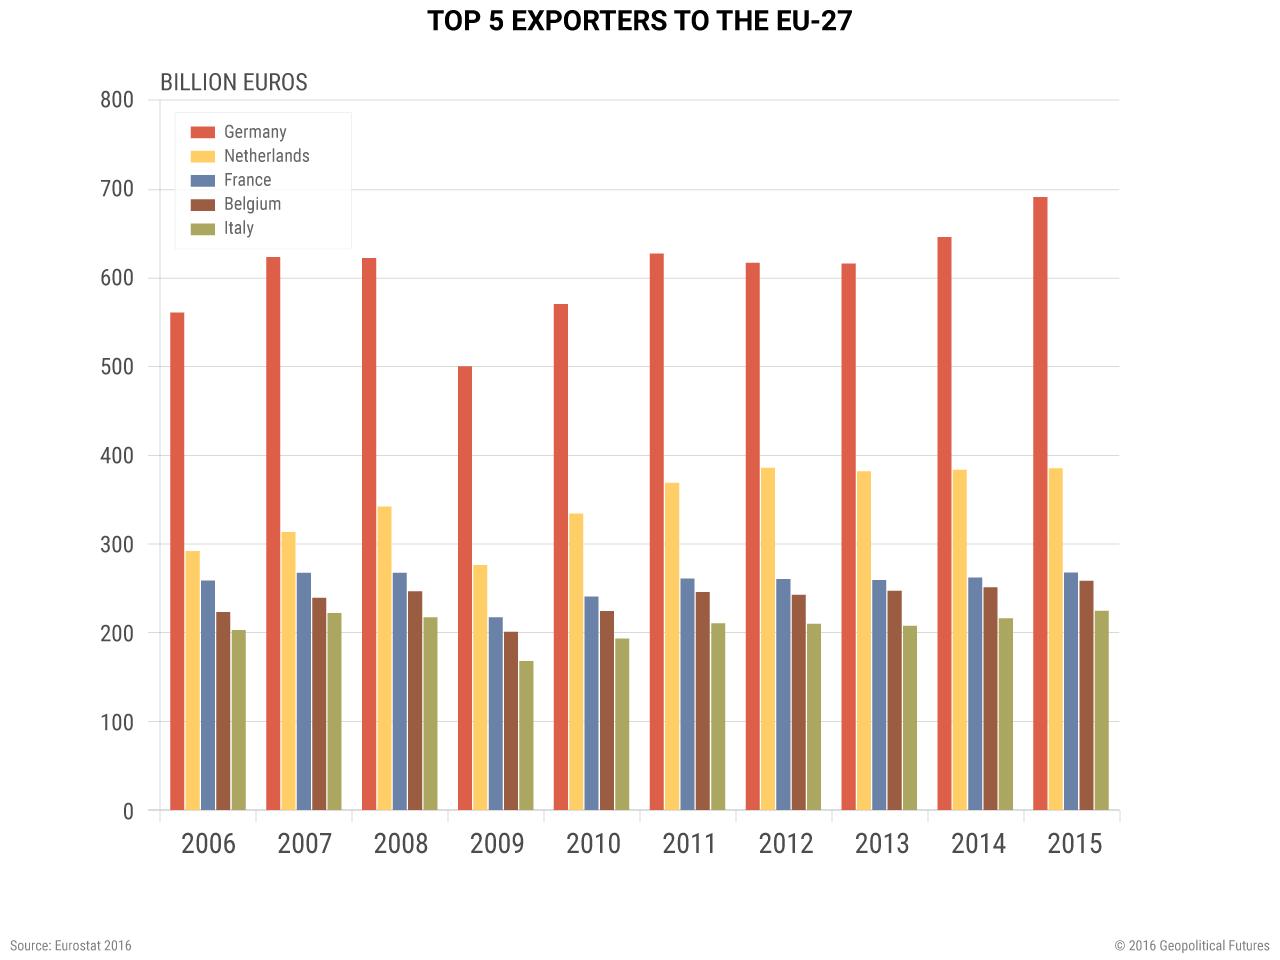 Top 5 Exporters to the EU-27